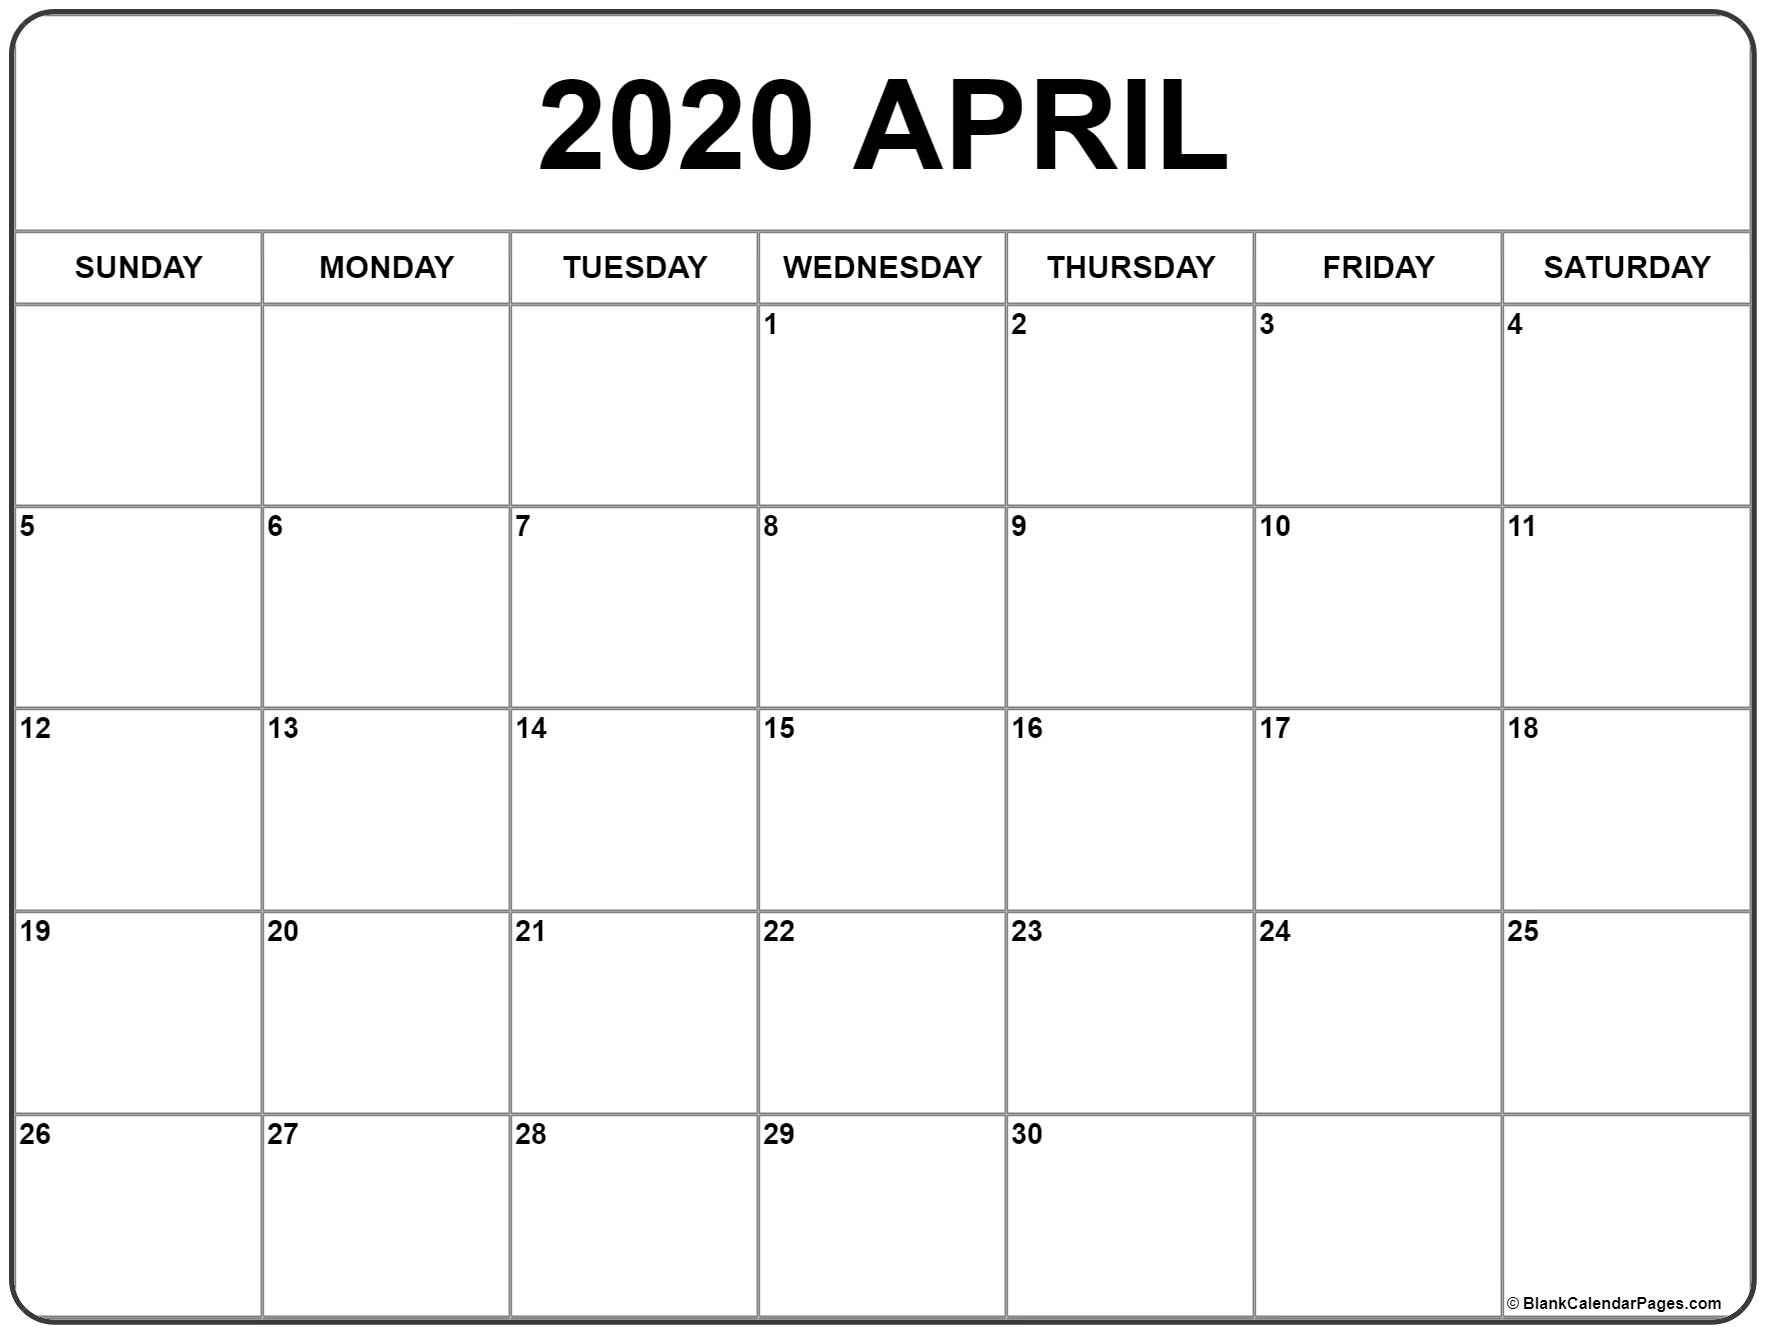 Printable Calendars April 2020  Bolan.horizonconsulting.co intended for April 2020 Printable Calendar